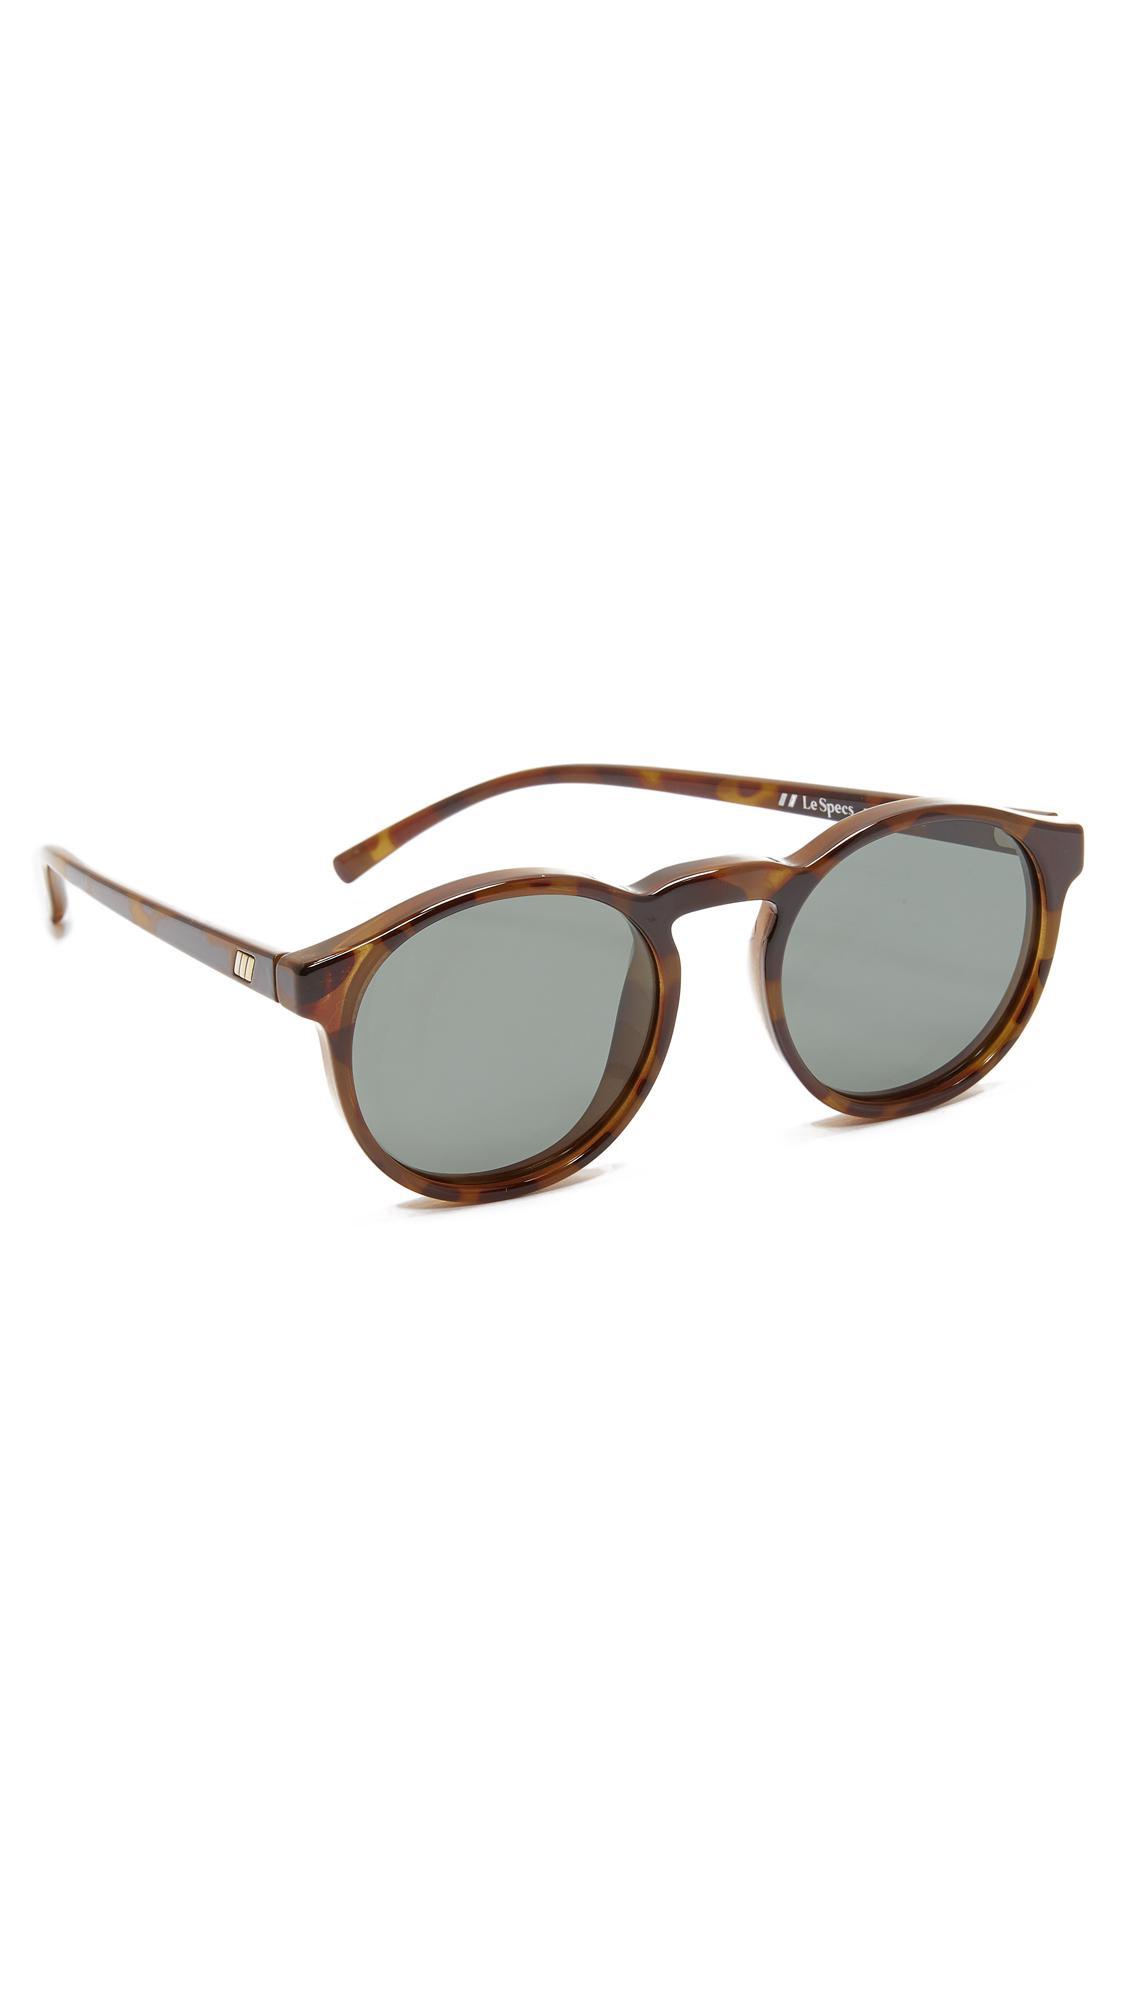 37bab0728c Le Specs Cubanos Sunglasses for Men - Lyst